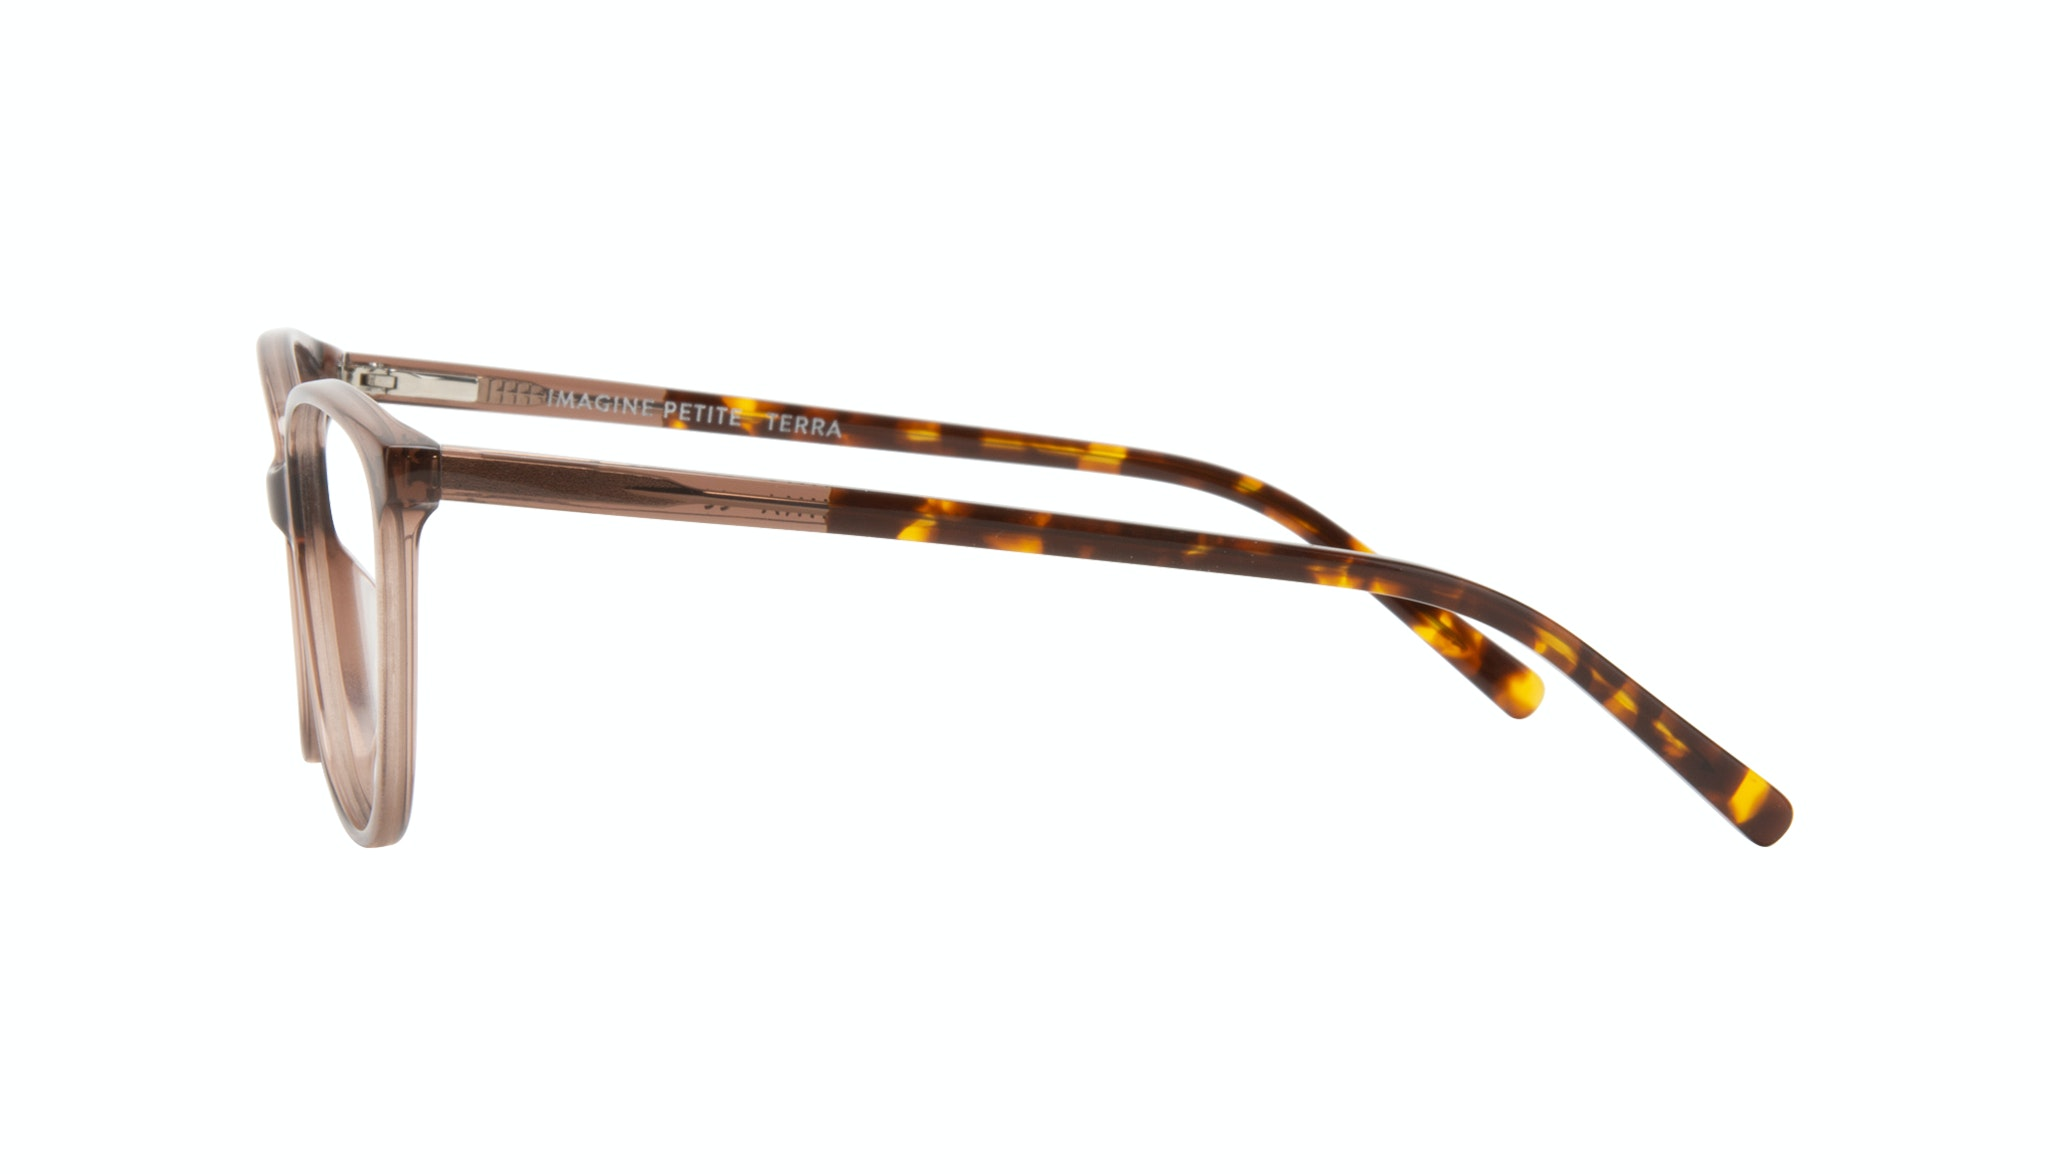 Affordable Fashion Glasses Round Eyeglasses Women Imagine Petite Terra Side